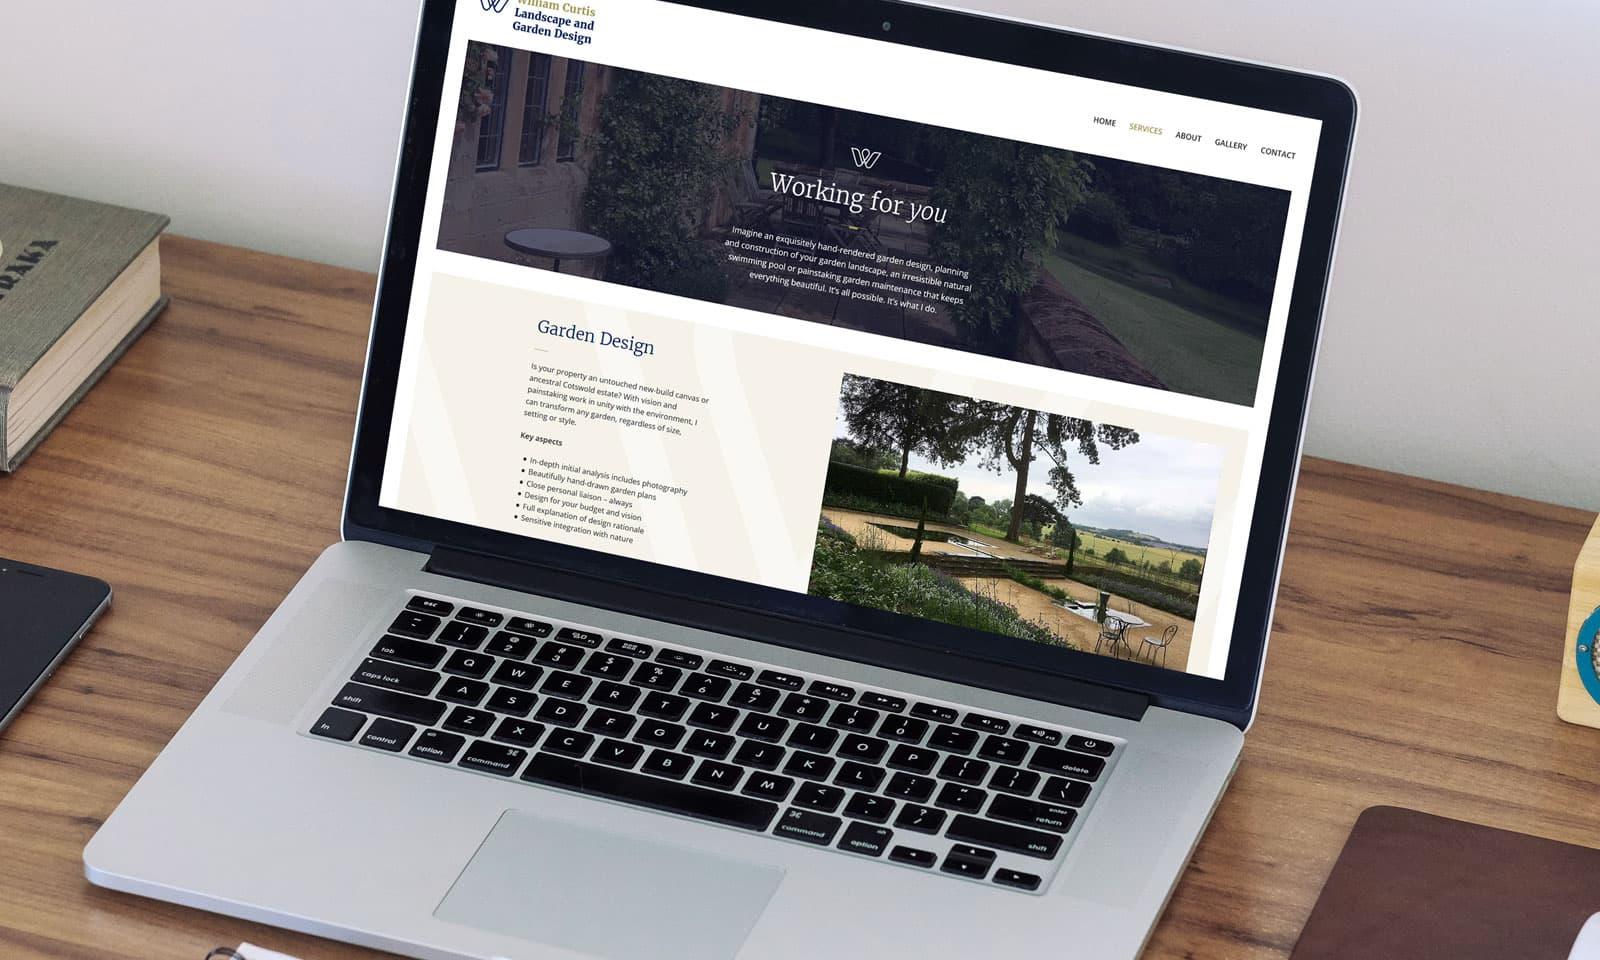 william-curtis-services-desktop